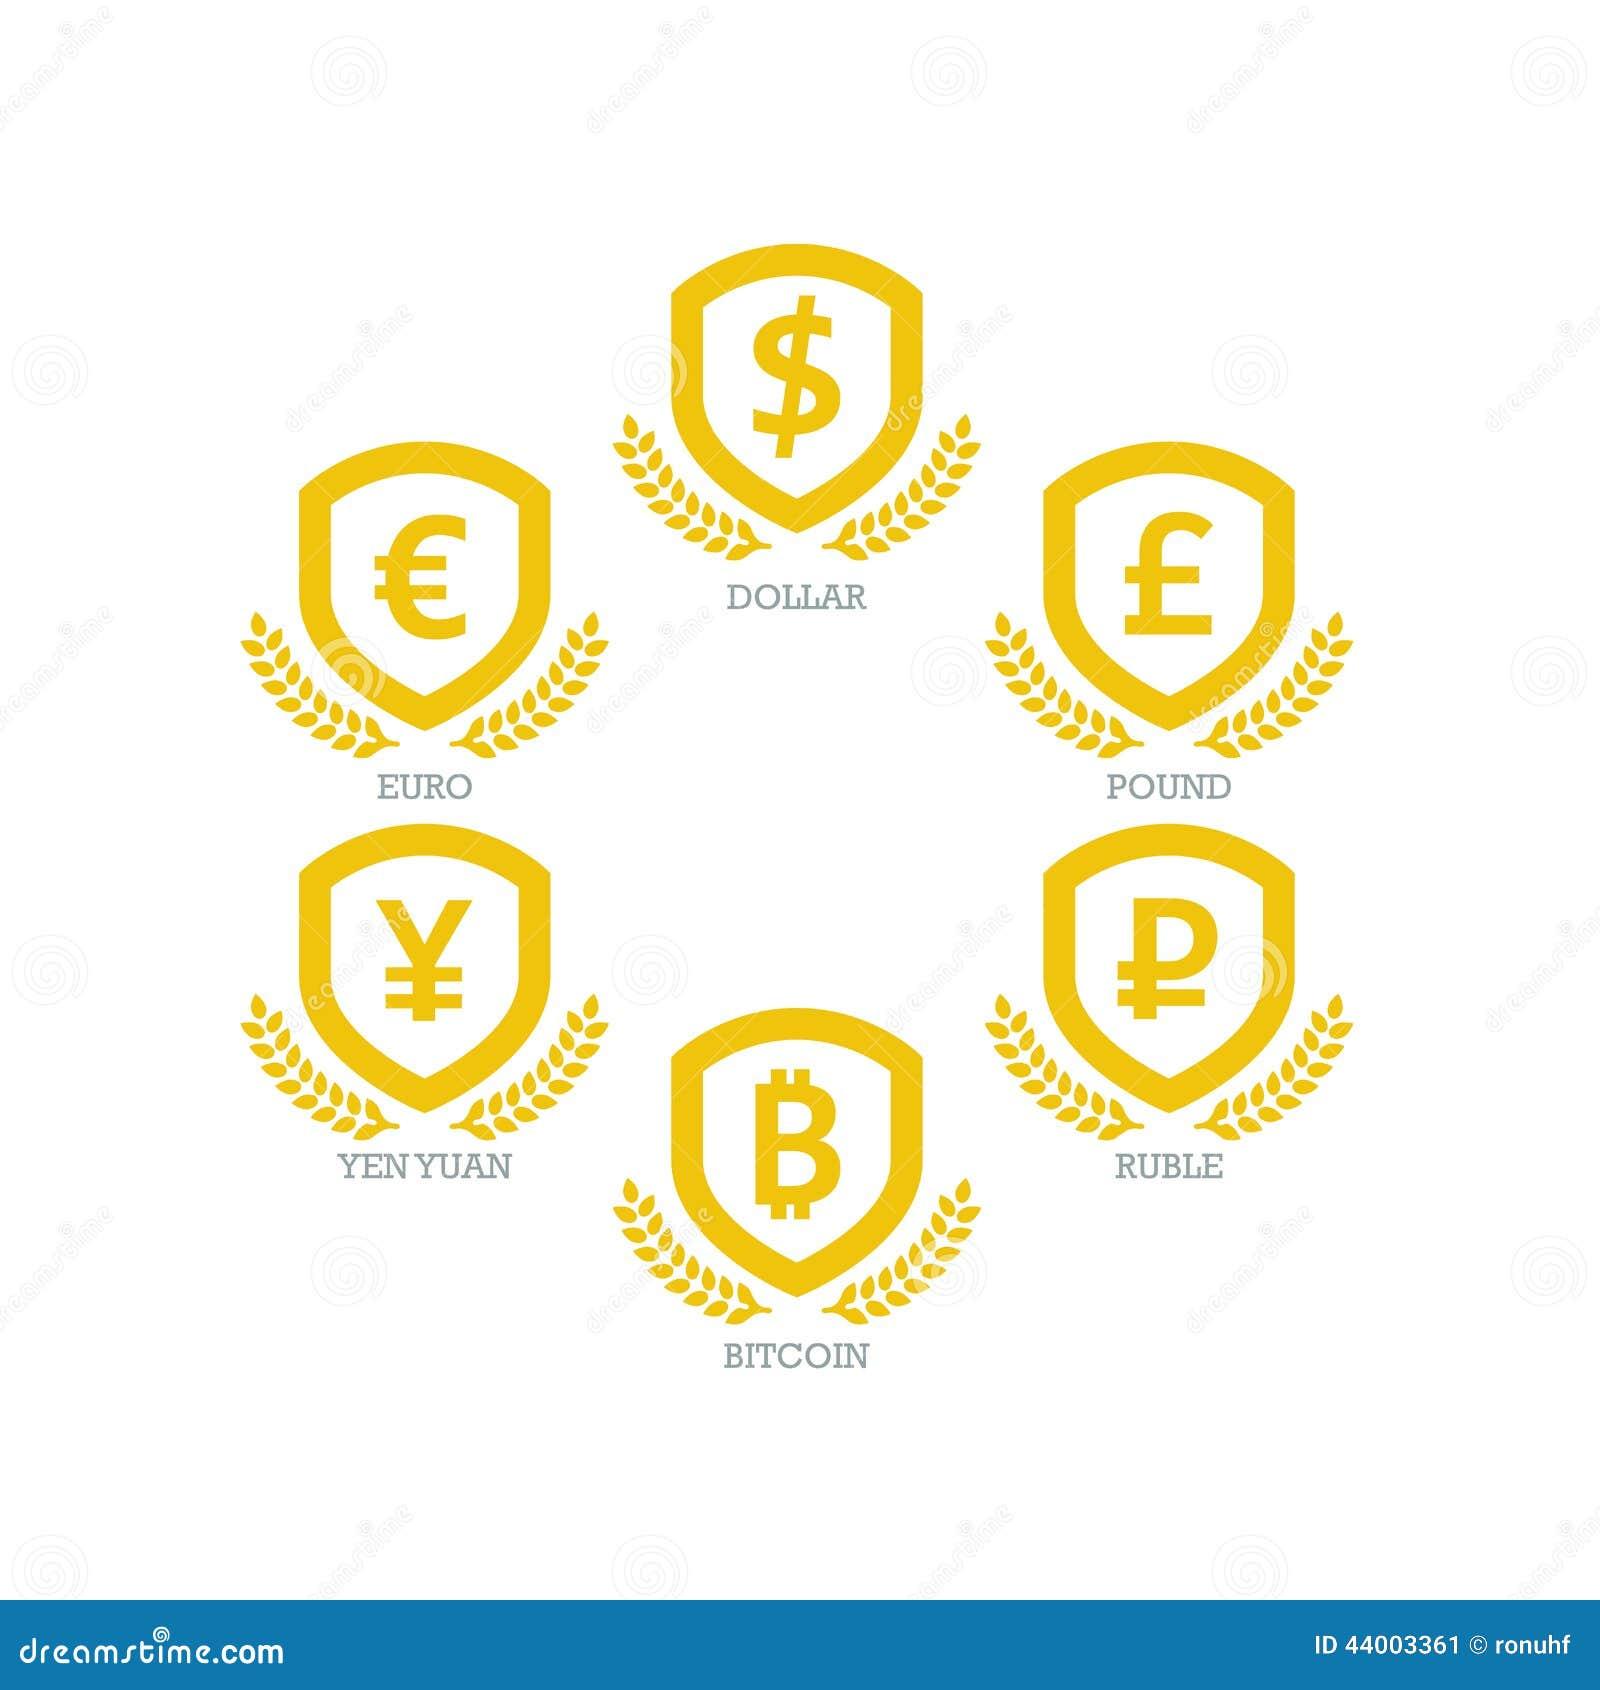 Euro dollar yen yuan bitcoin ruble pound mainstream currencies euro dollar yen yuan bitcoin ruble pound mainstream currencies symbols on shield sign vector illustration graphic template isolat biocorpaavc